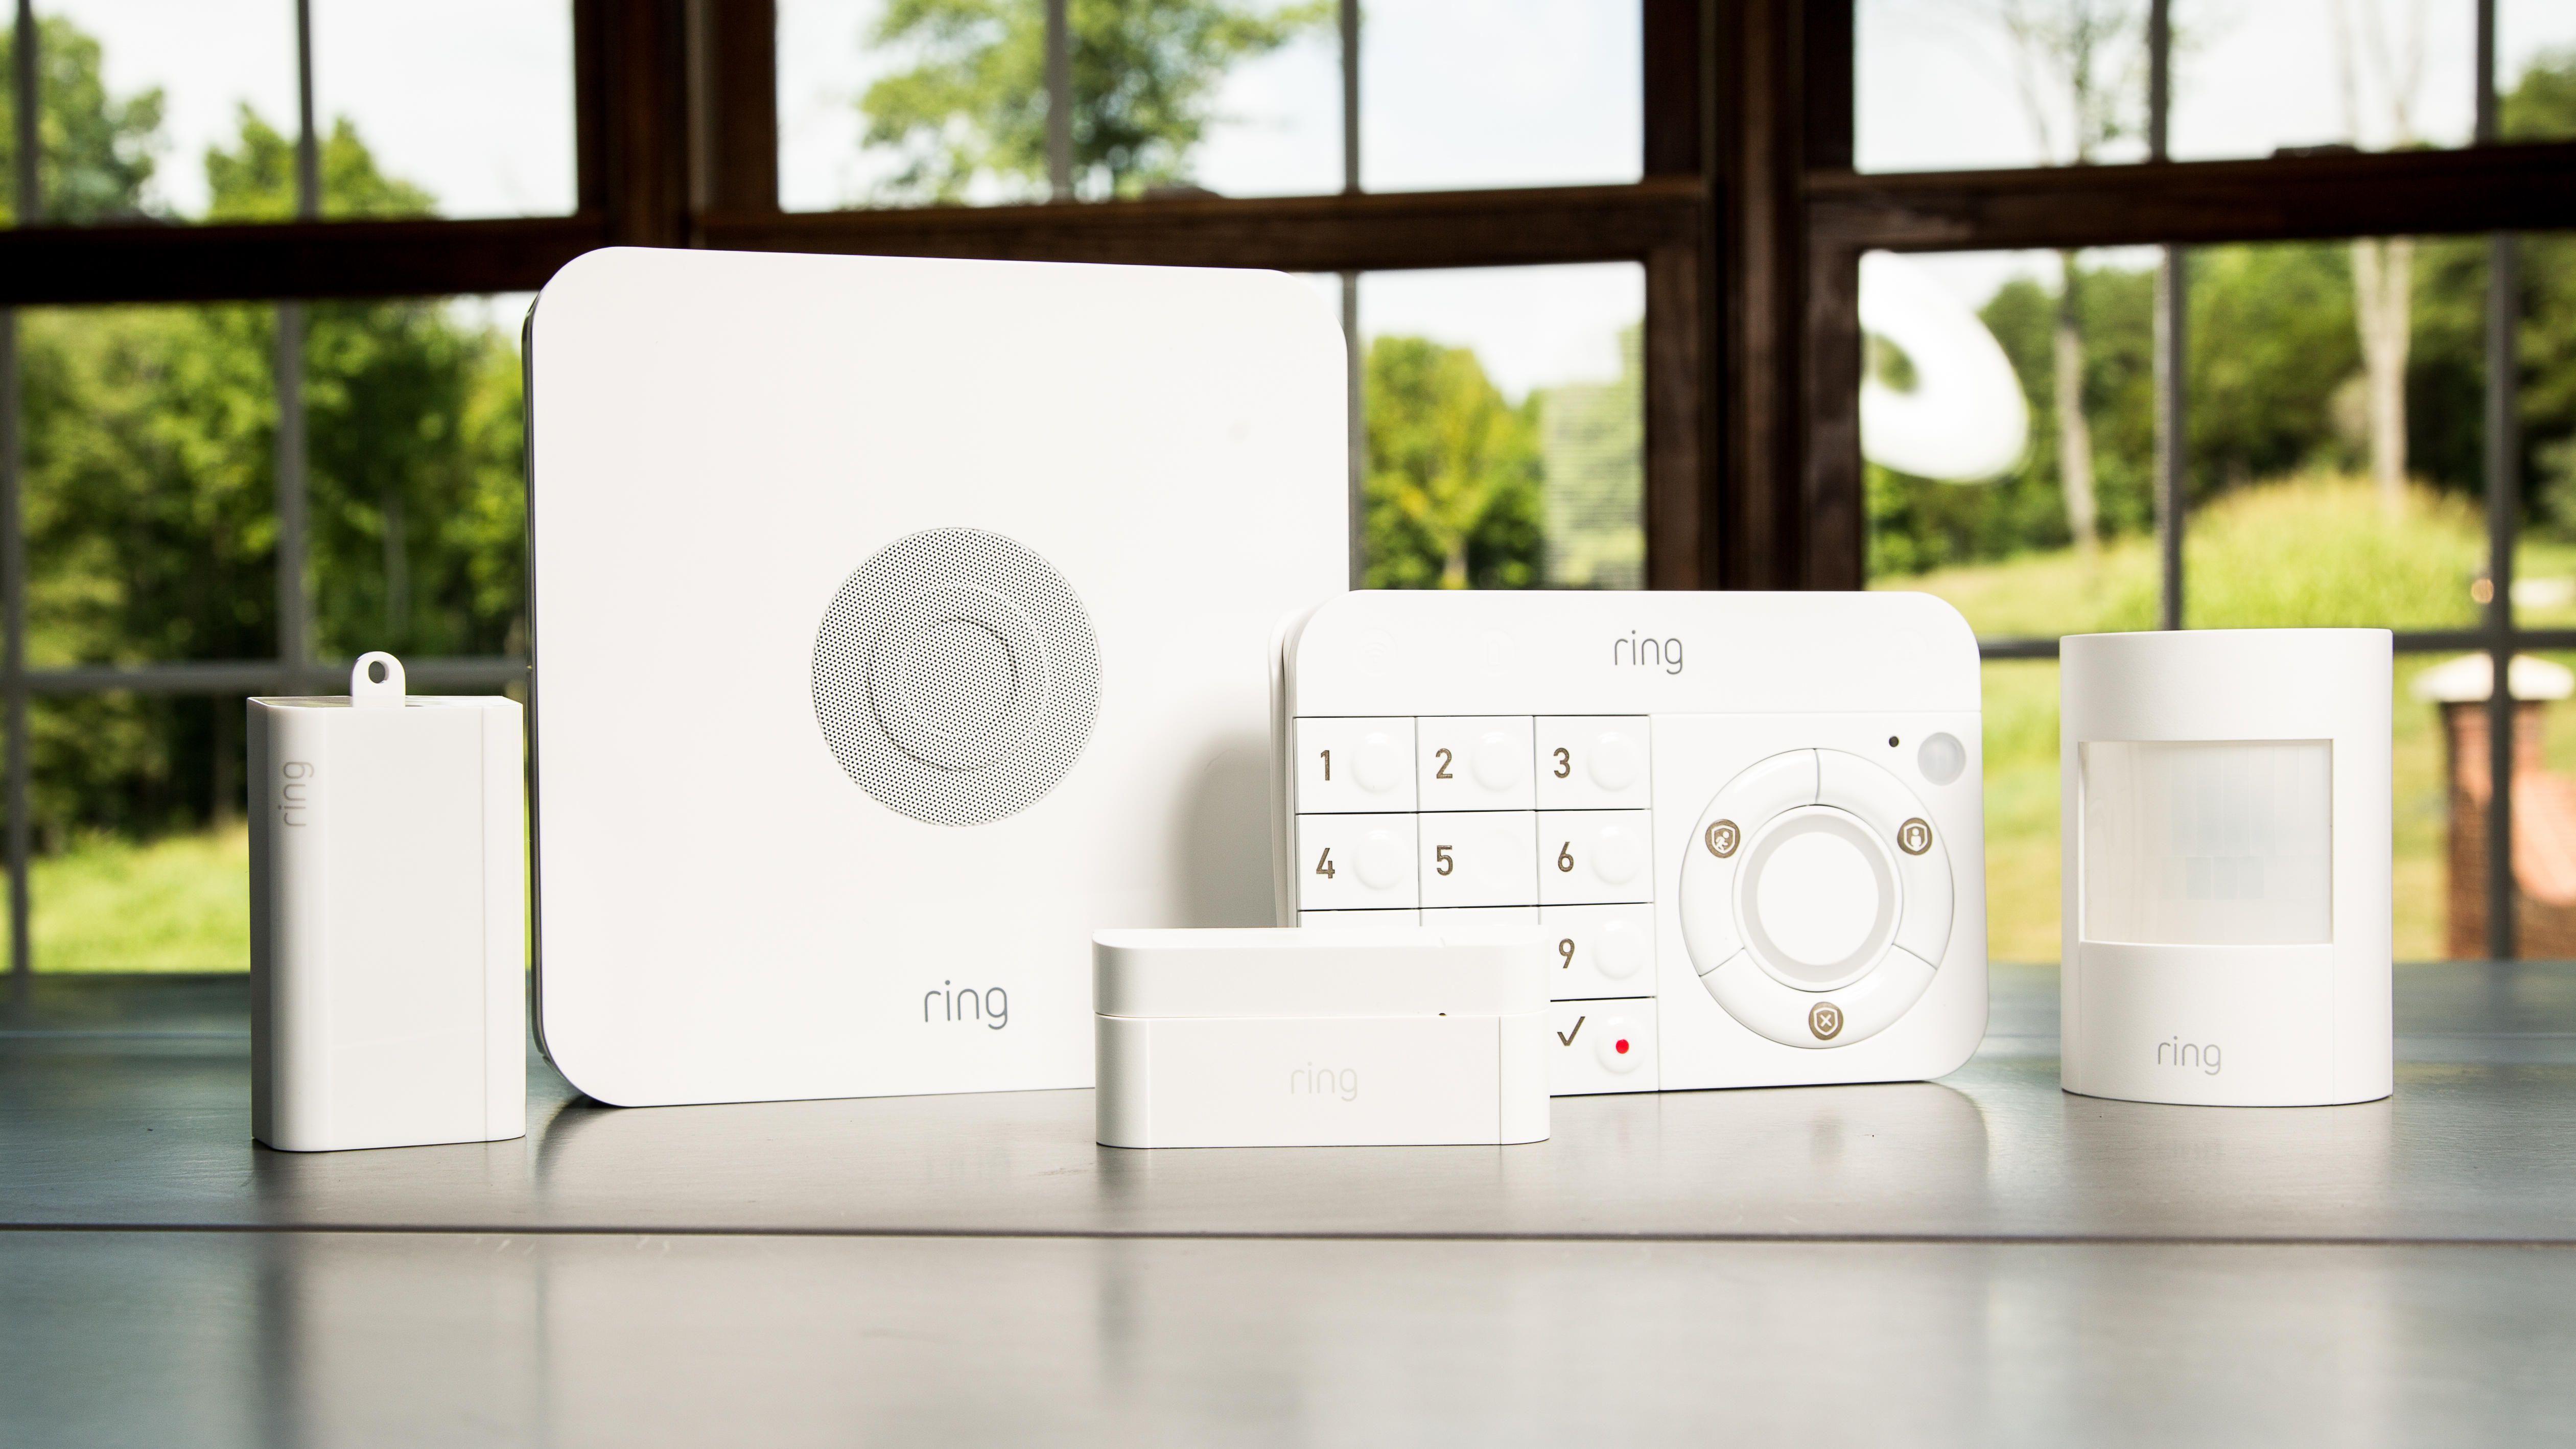 Security System Systems Wireless Diy Monitoring Cctv Installation Tx Camera Alarm Companies Safety Res Diy Security System Home Security Companies Diy Security